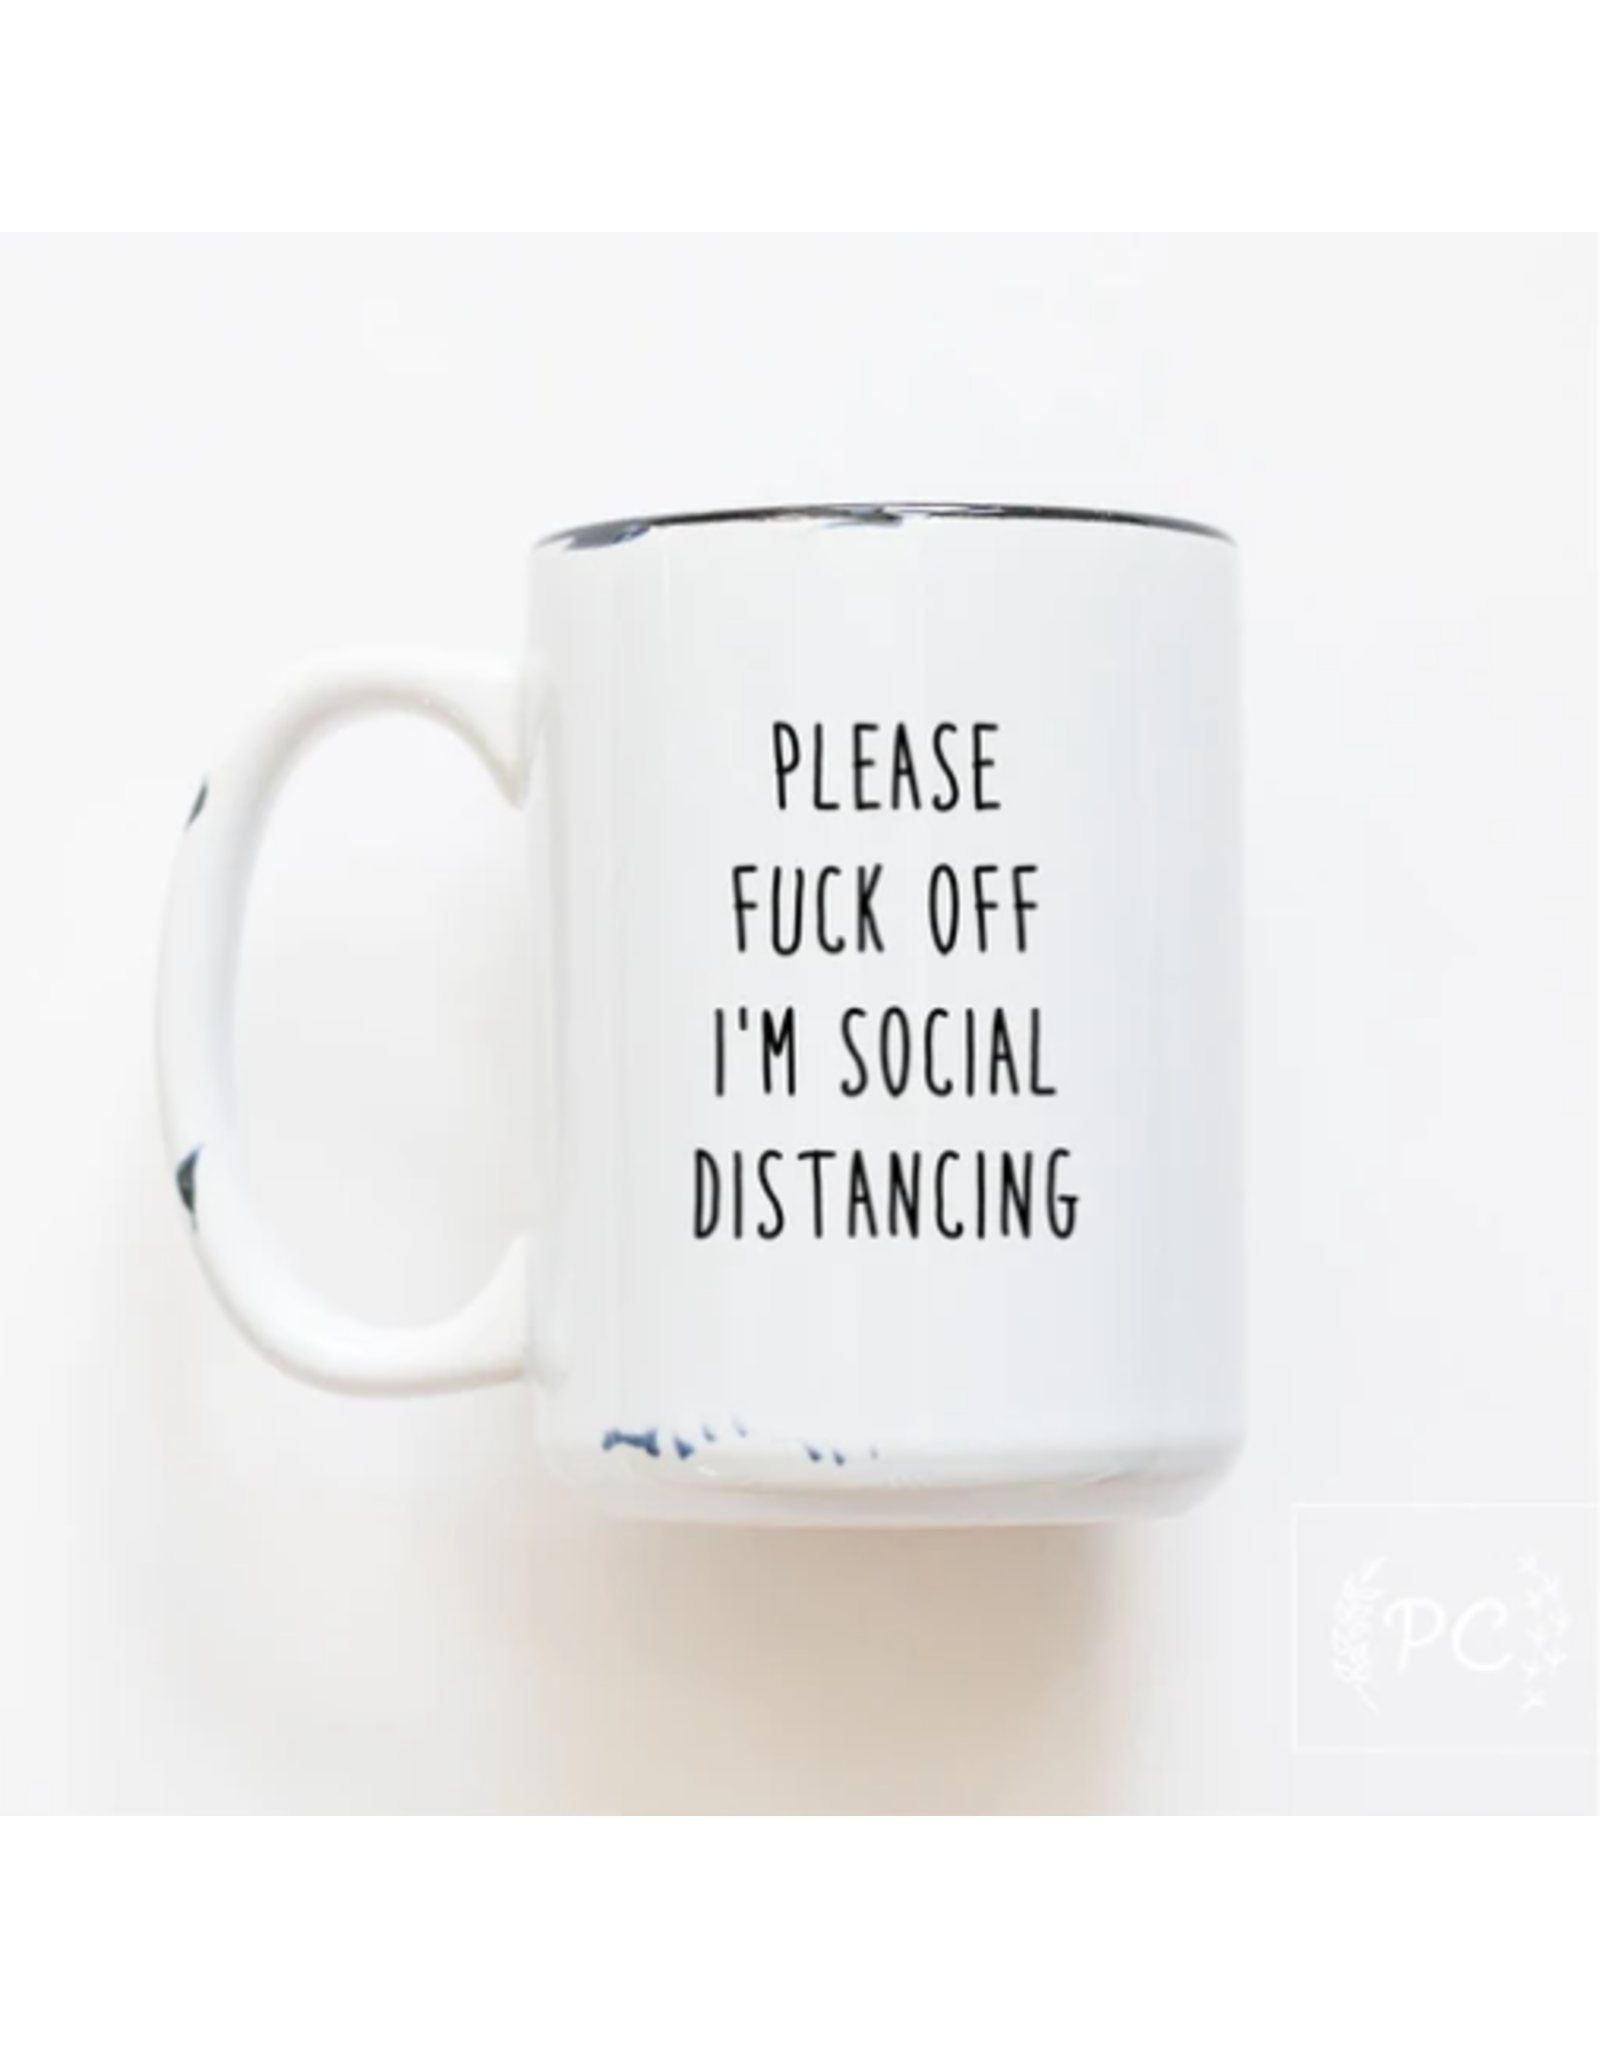 Praire Chick Prints Social Distancing - Mug